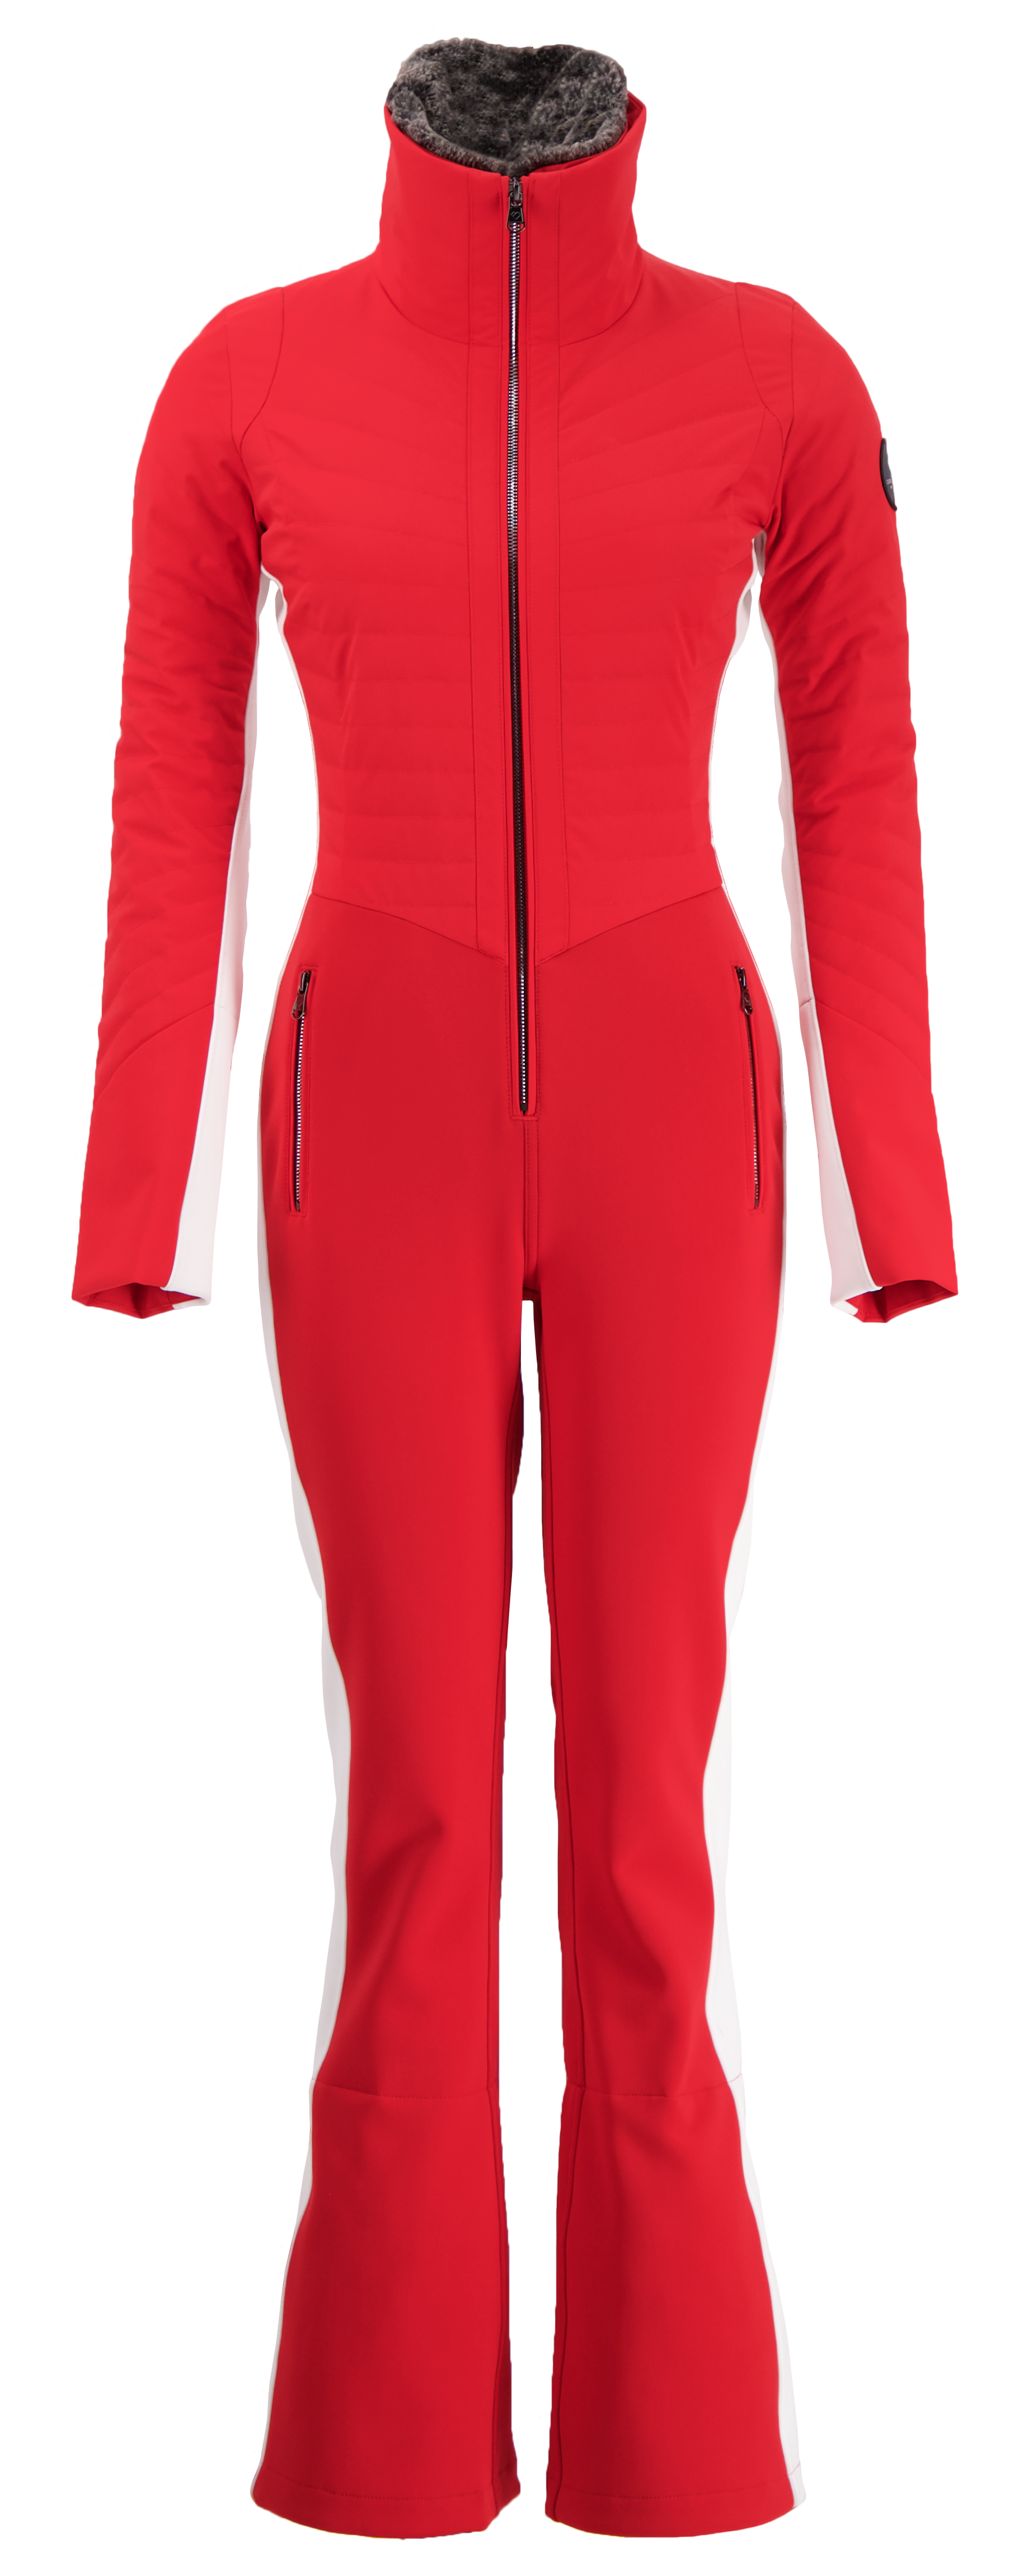 The 2021 Dynastar M Pro 90 W Women's All-Mountain Ski thumb